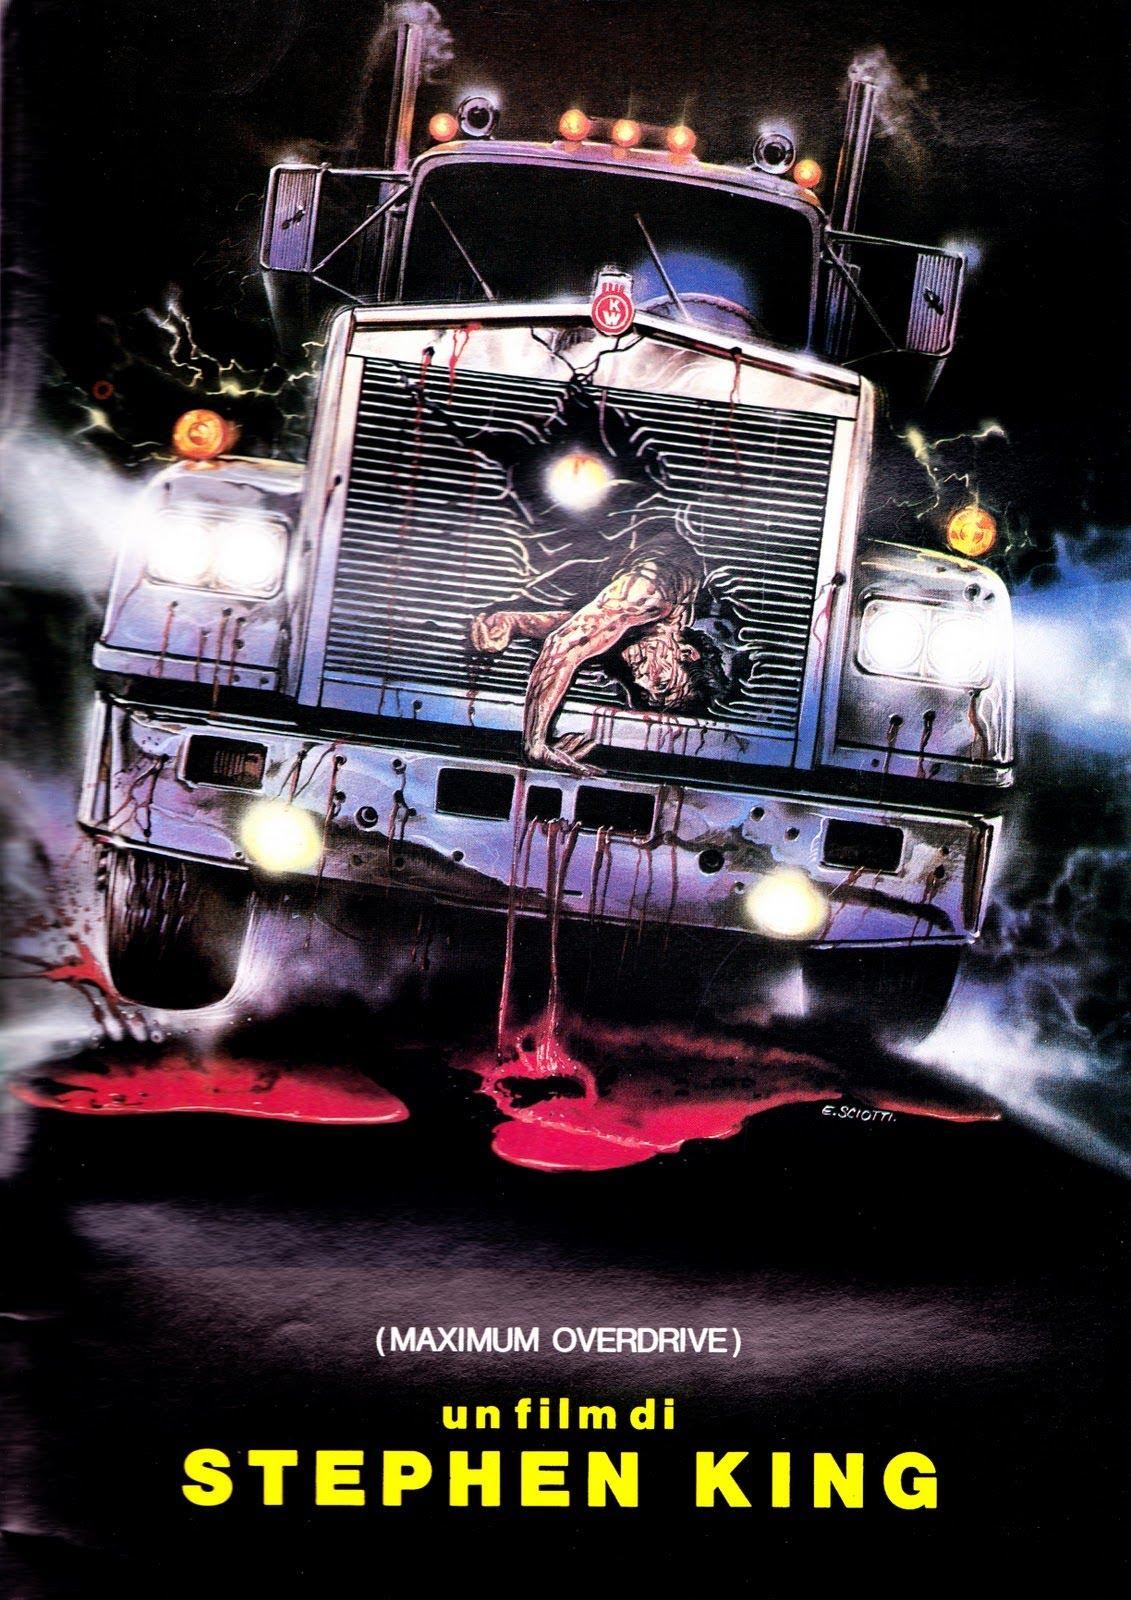 MOVIES & MANIA | Maximum Overdrive - USA, 1986